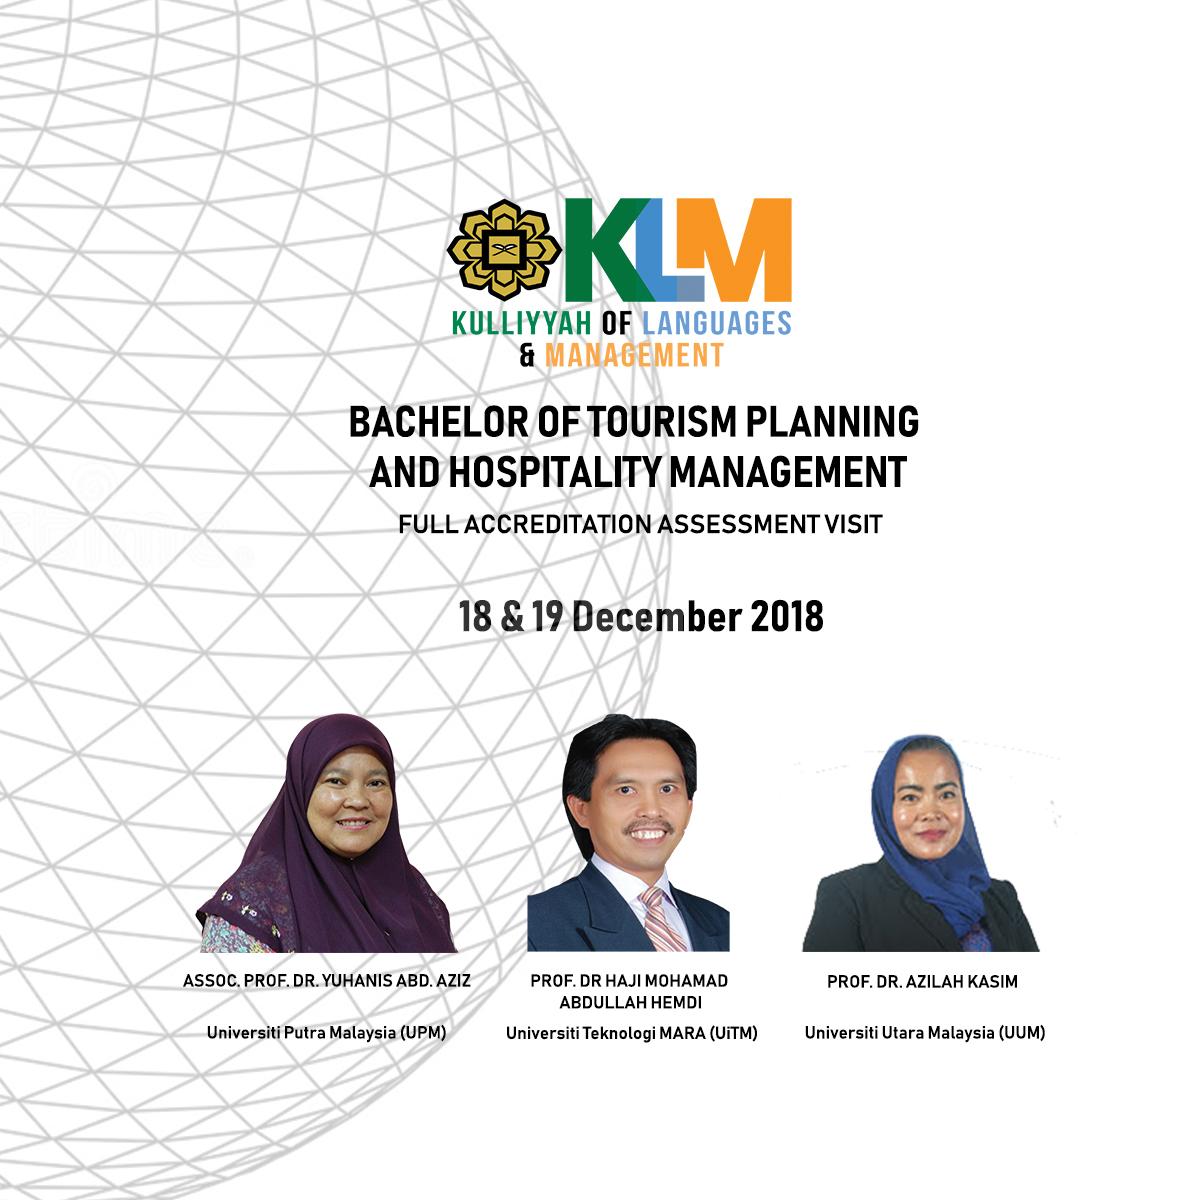 Full Accreditation Assessment Visit for Bachelor of Tourism Planning and Hosplitality Management